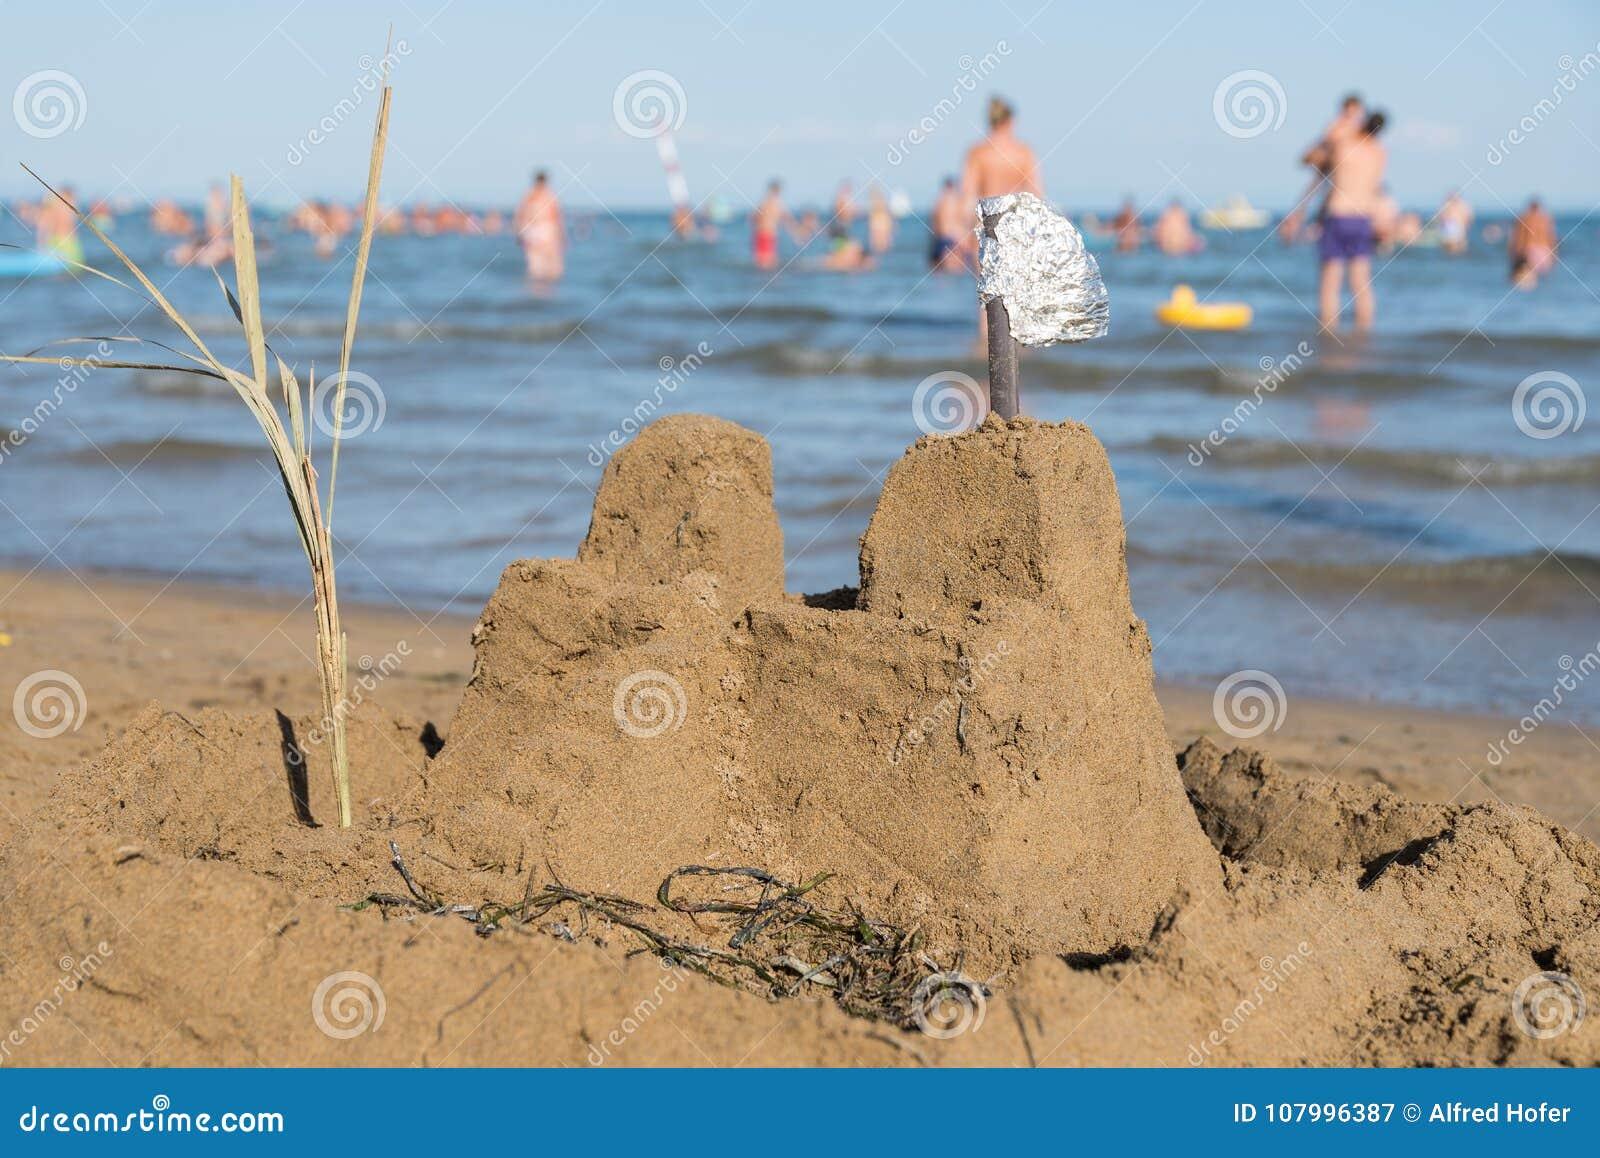 Sandcastle overlooking sea